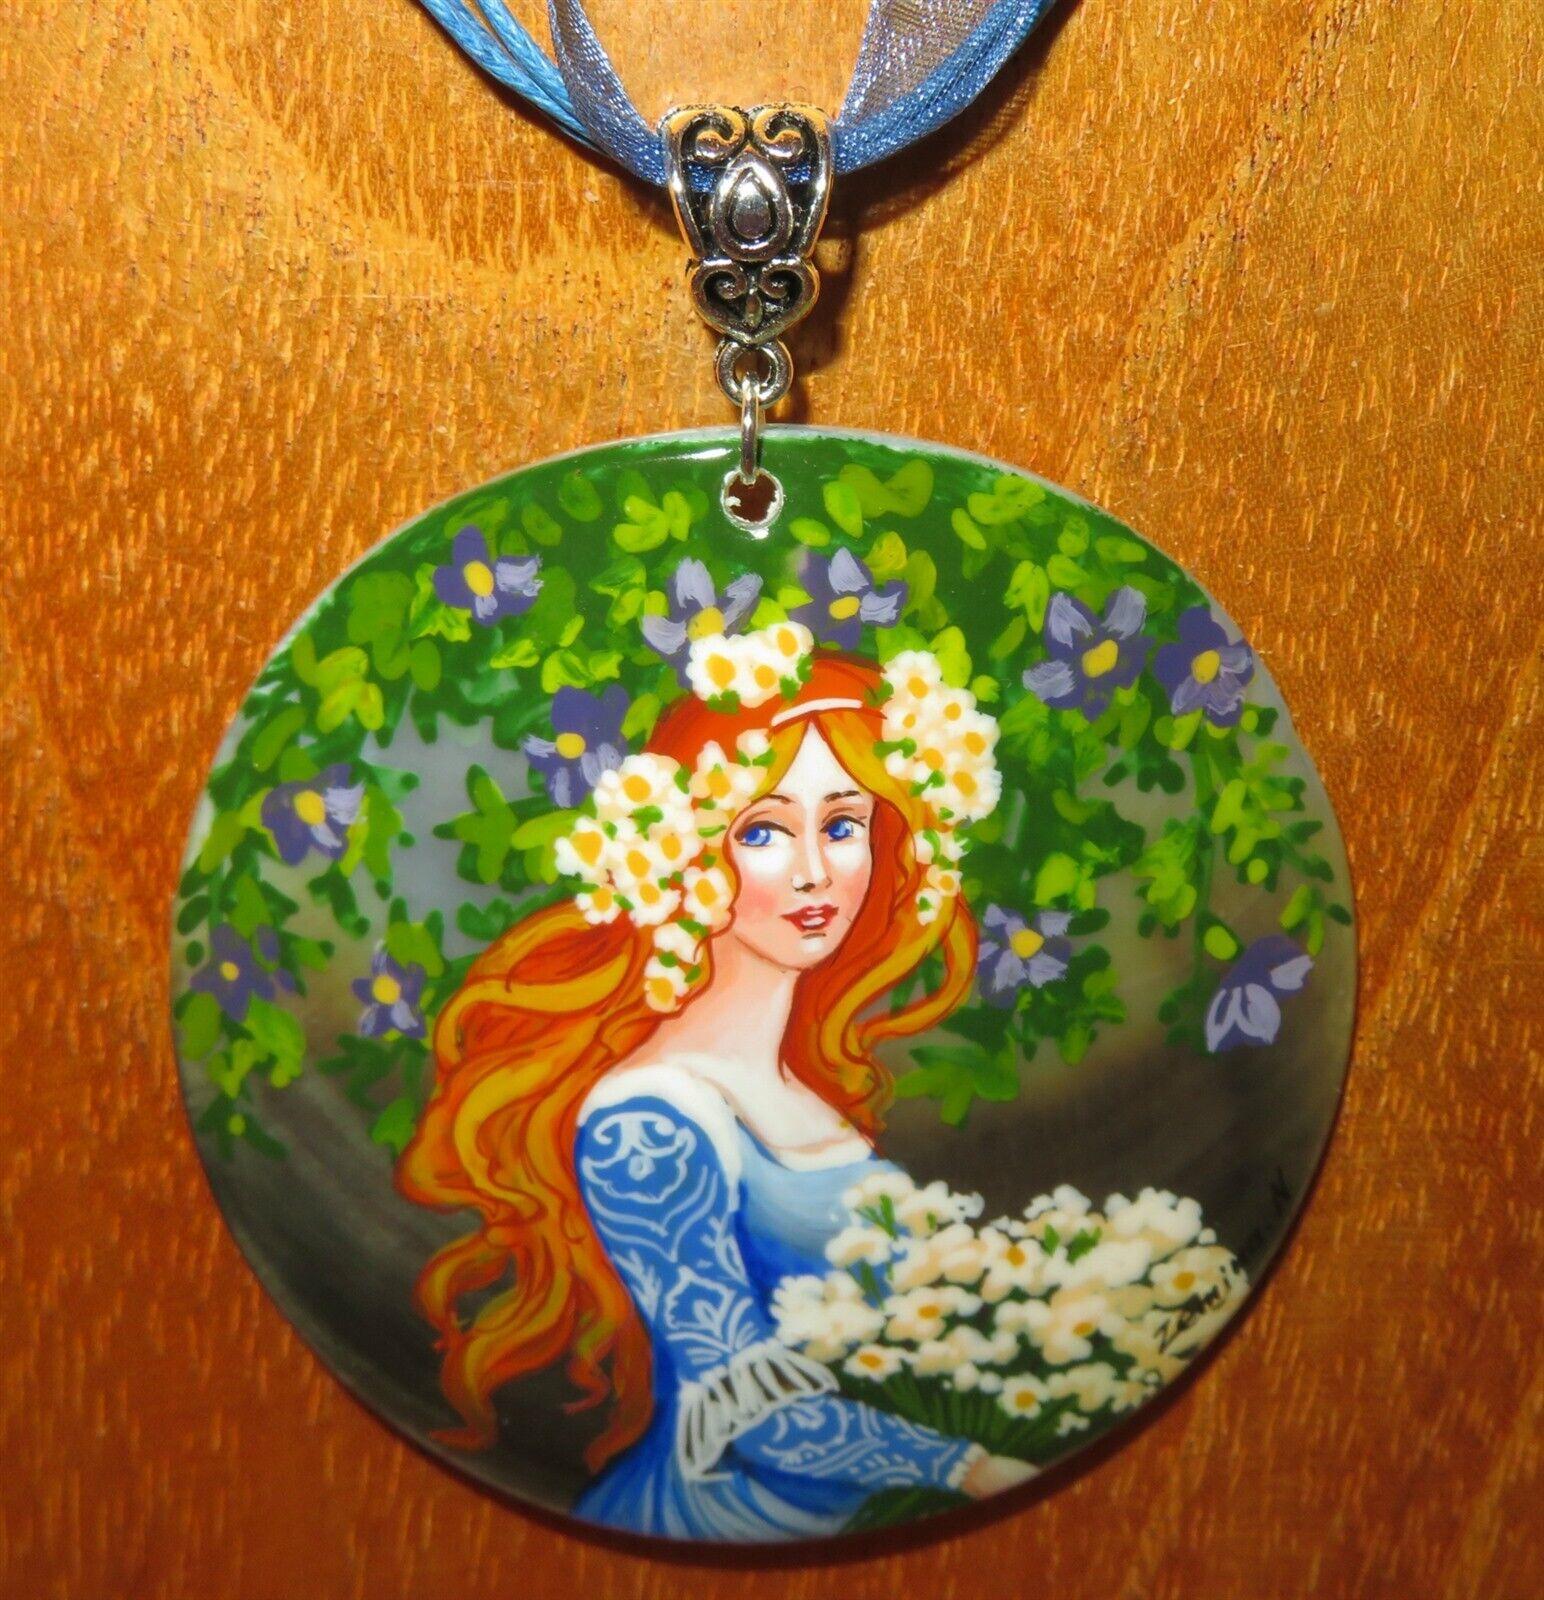 Pendant Elisabeth Sonrel Girl in bluee Hand Made Shell Art Nouveau Illustration